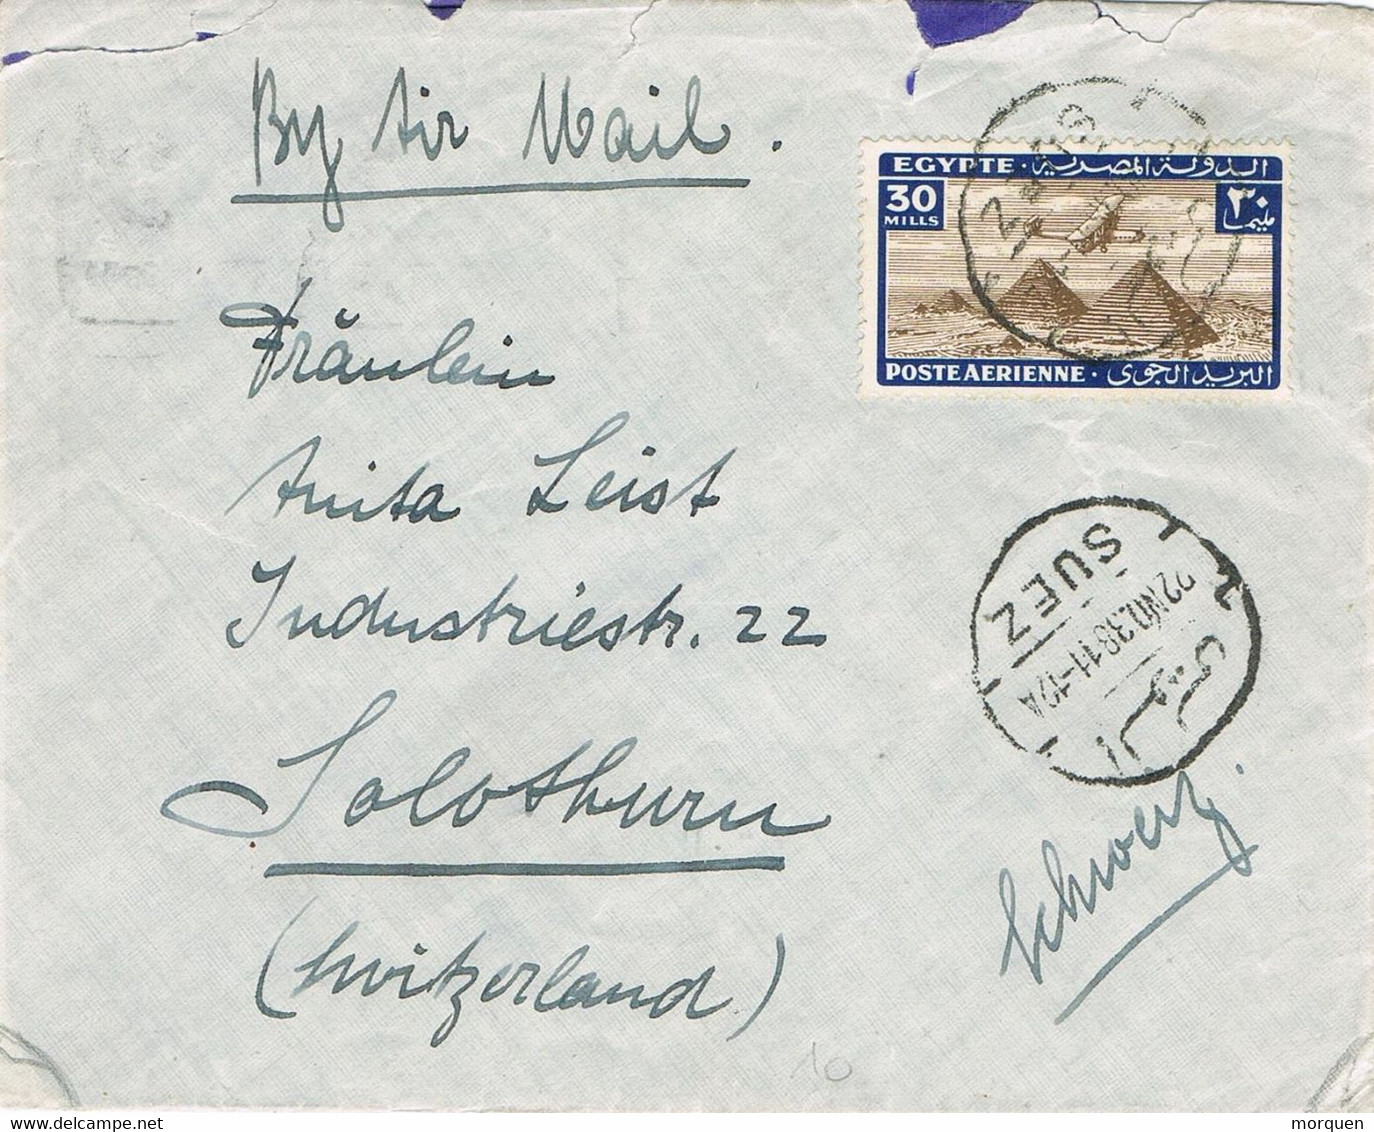 40404. Carta Aerea SUEZ (Egypt) 1938. Piramids Stamp - Covers & Documents